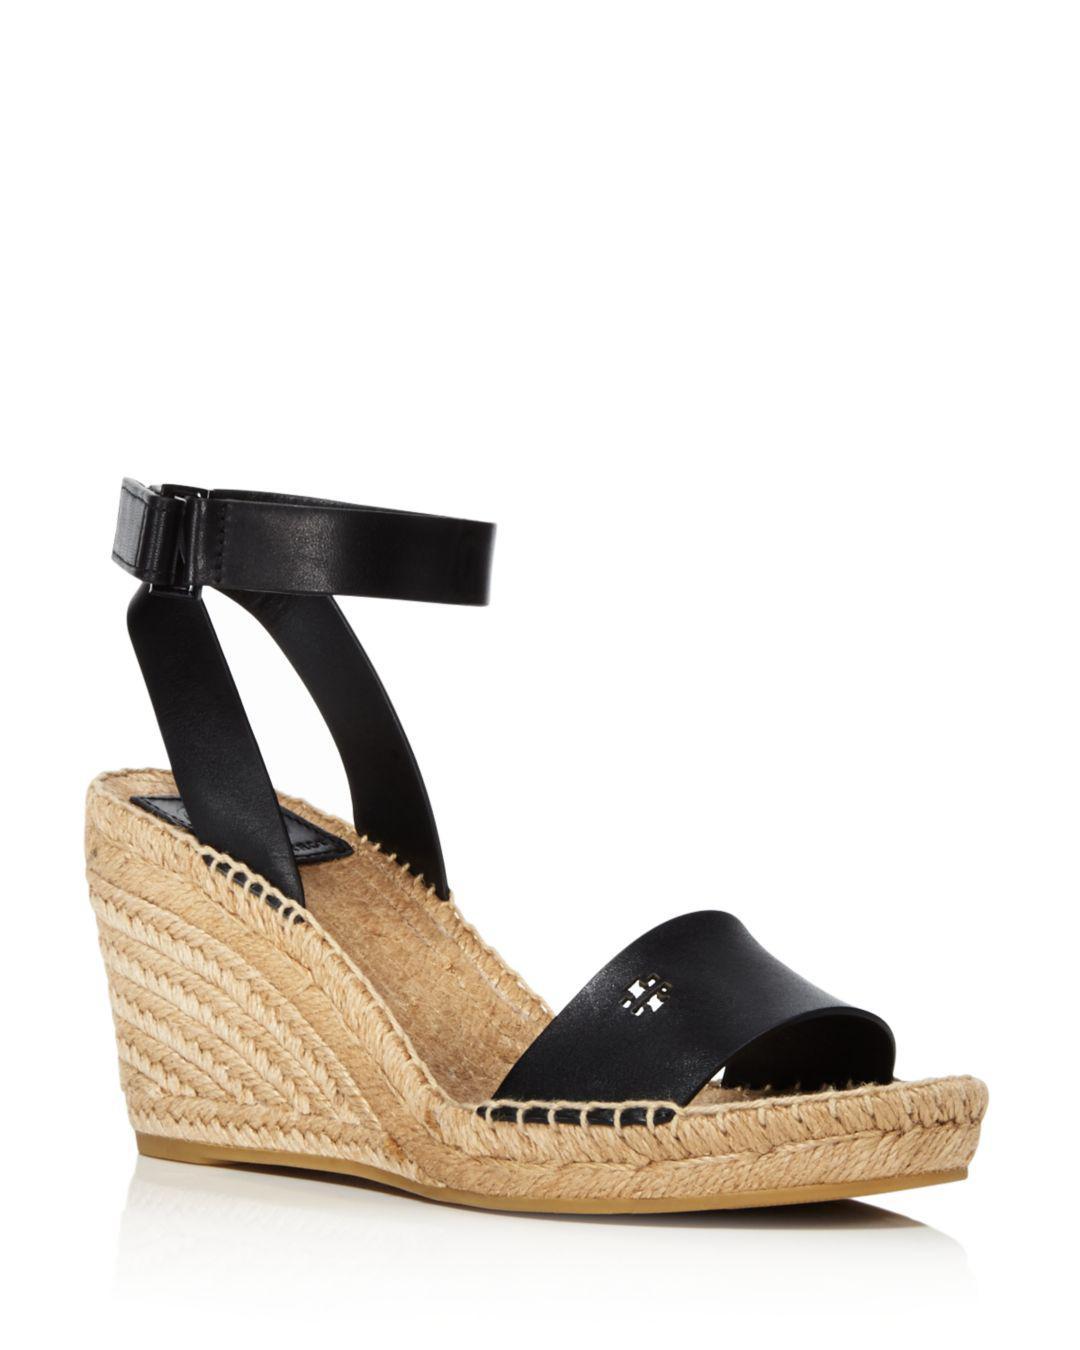 f2d861363c26cf Tory Burch Women s Bima Espadrille Platform Wedge Sandals in Black ...